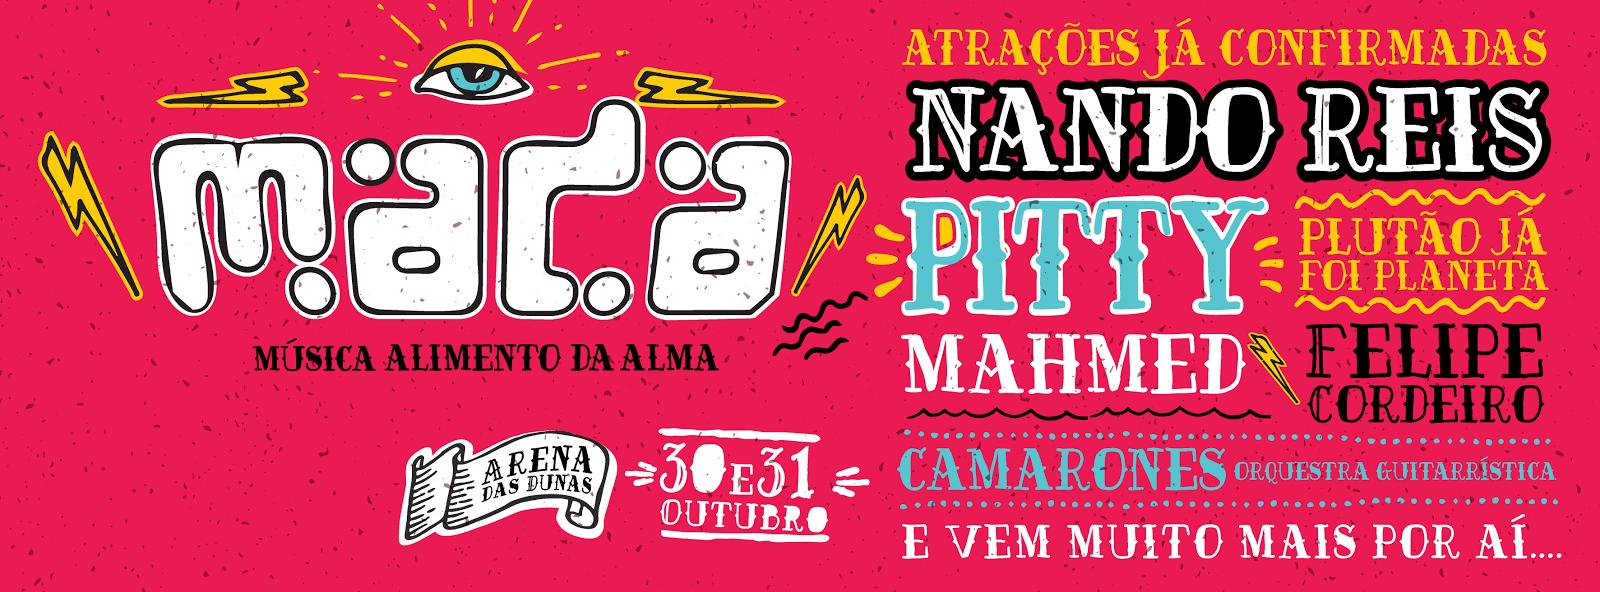 Festival Mada 2015